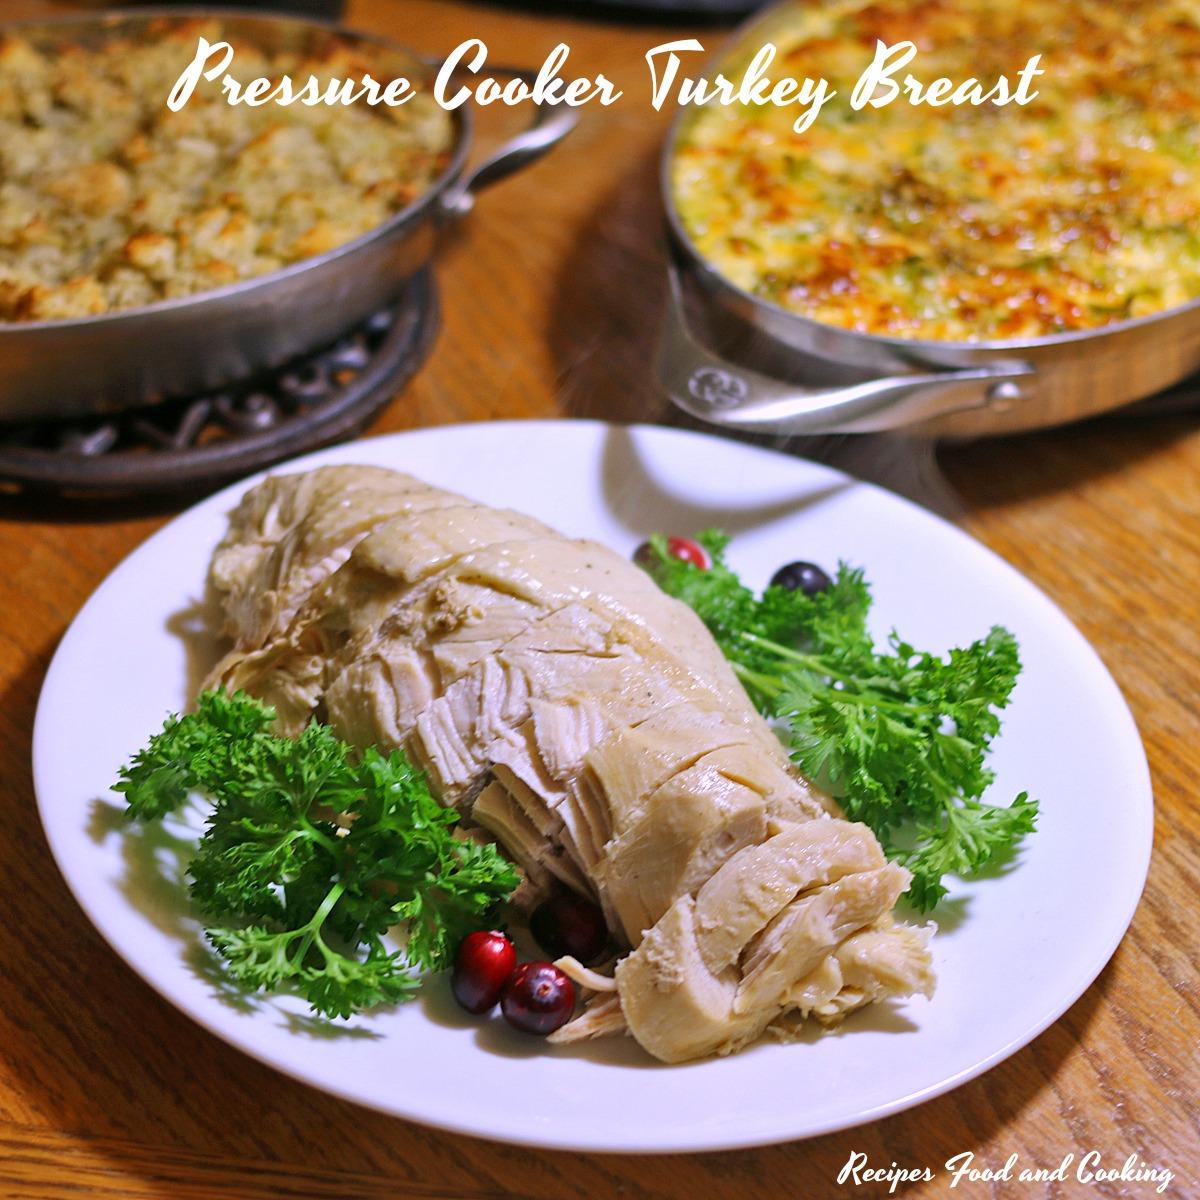 Pressure Cooker Turkey Breast